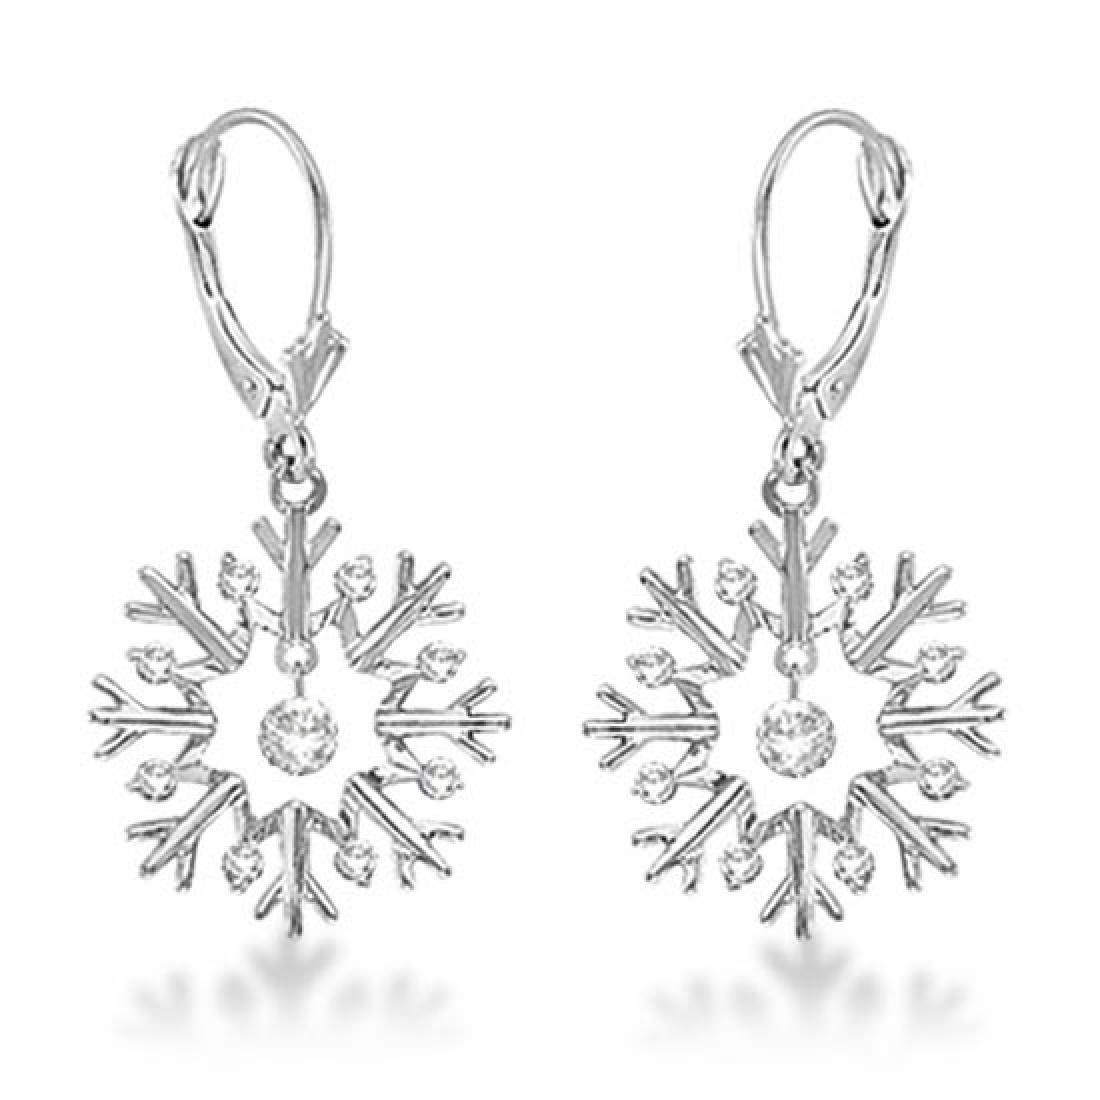 Snowflake Shaped Dangle Drop Diamond Earrings 14K White